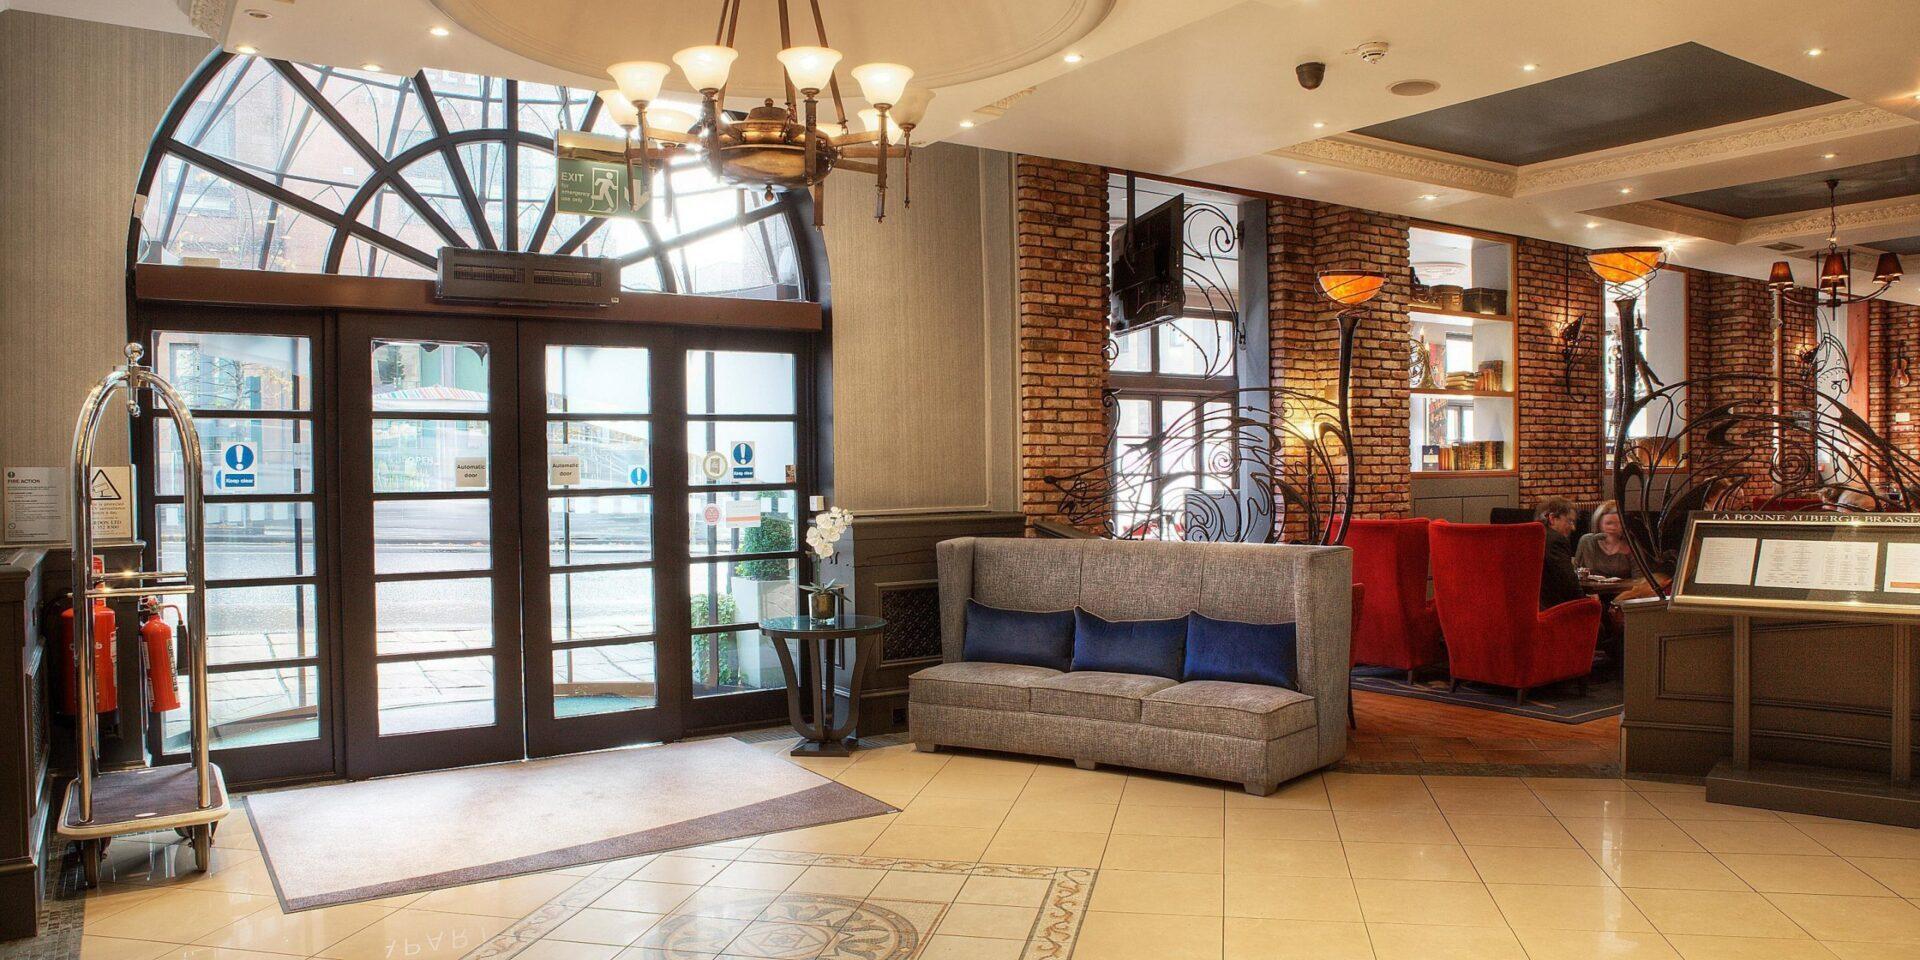 Holiday-Inn-Theatreland-inside